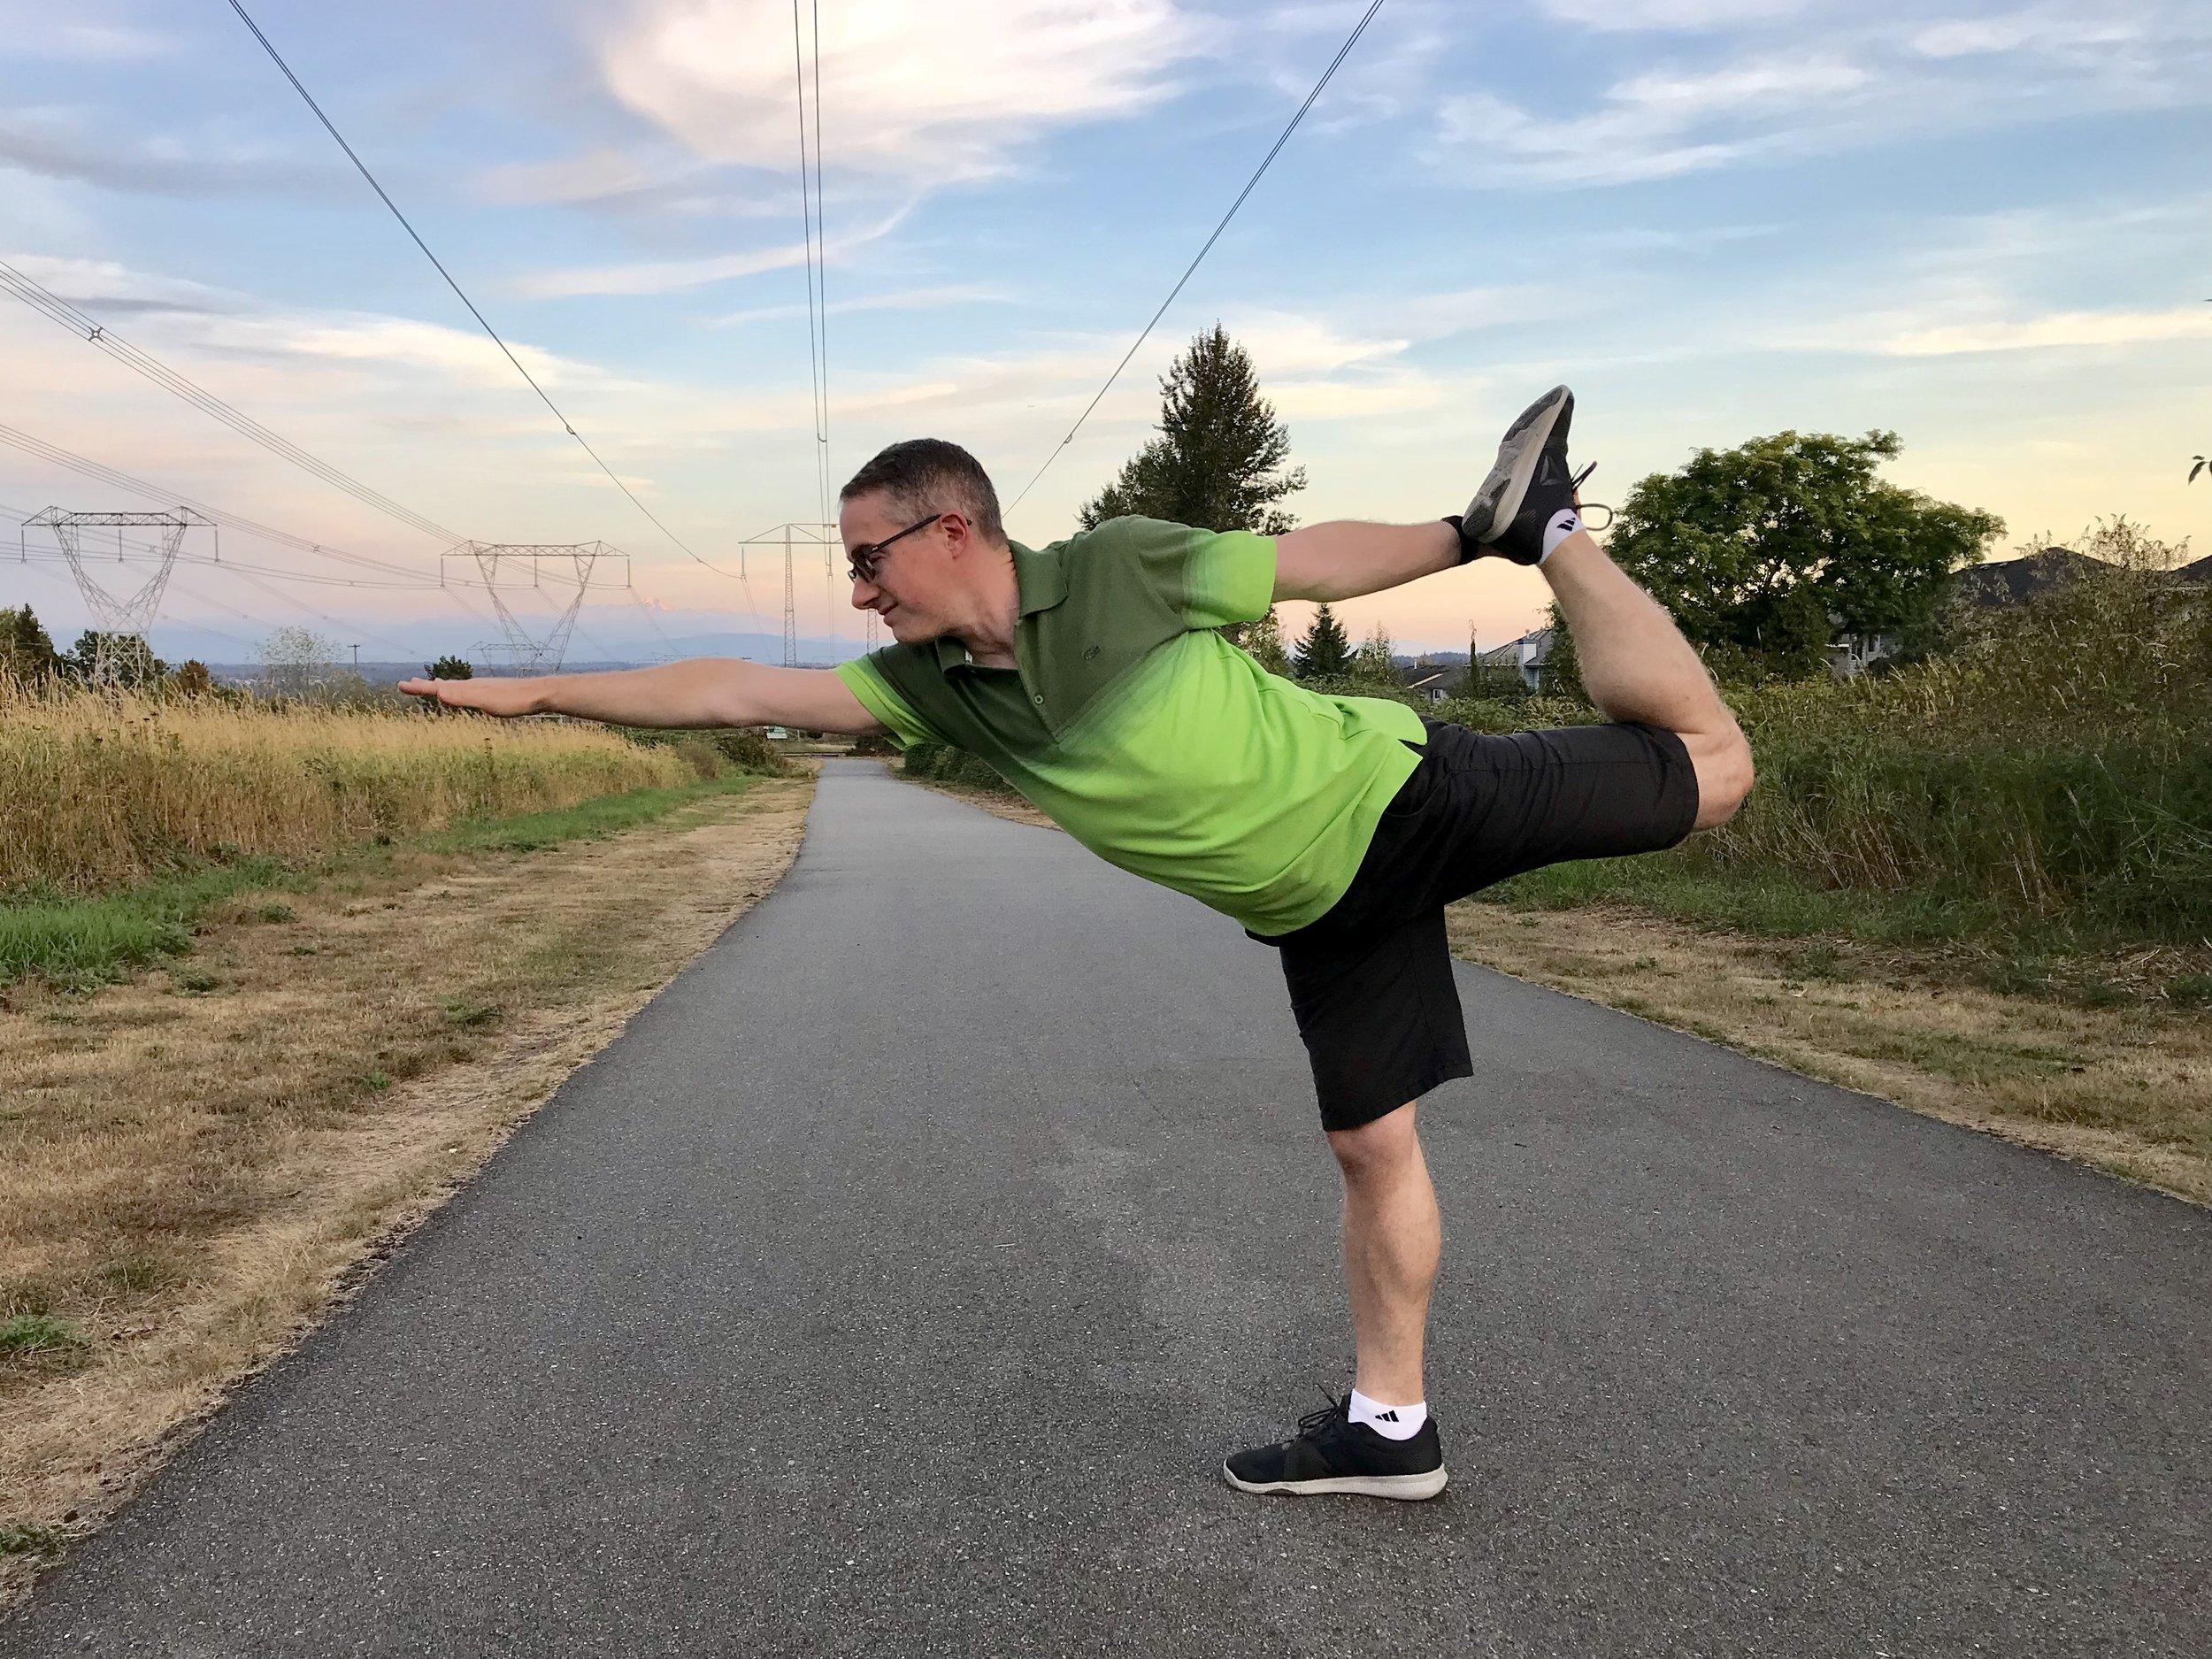 Best Exercise For Health Anxiety Bikram Yoga Healthanxiety Coach